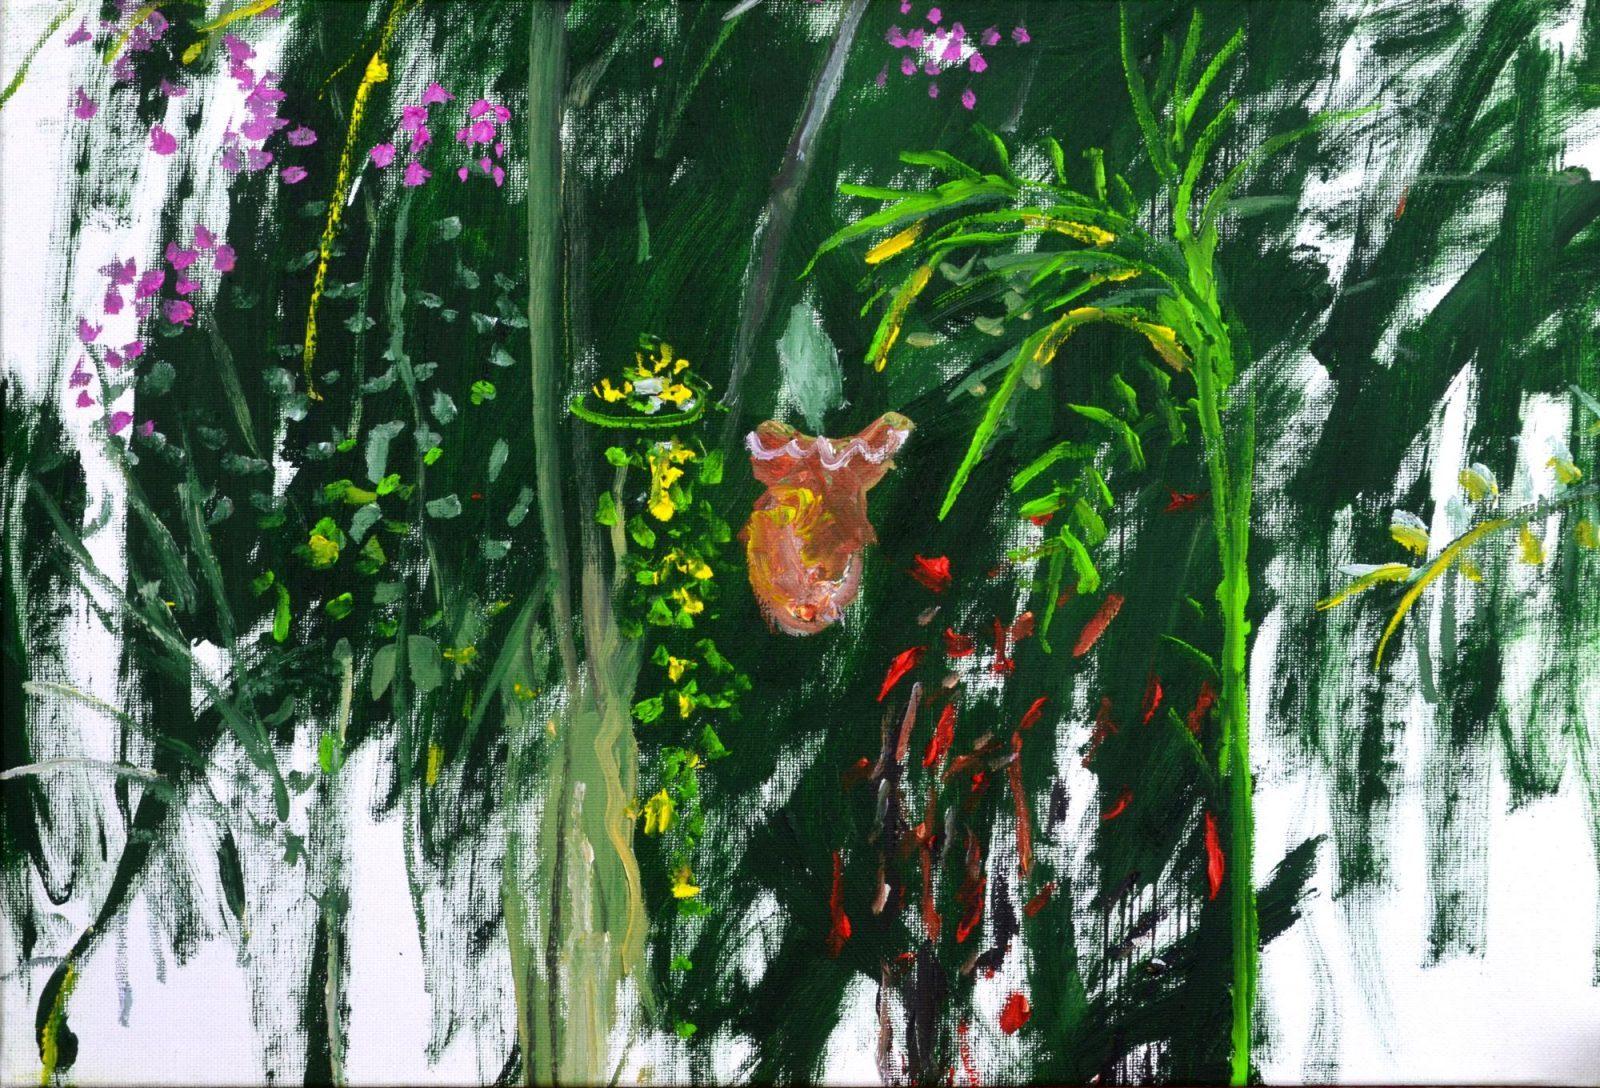 franyo aatoth: Garden Series 17.